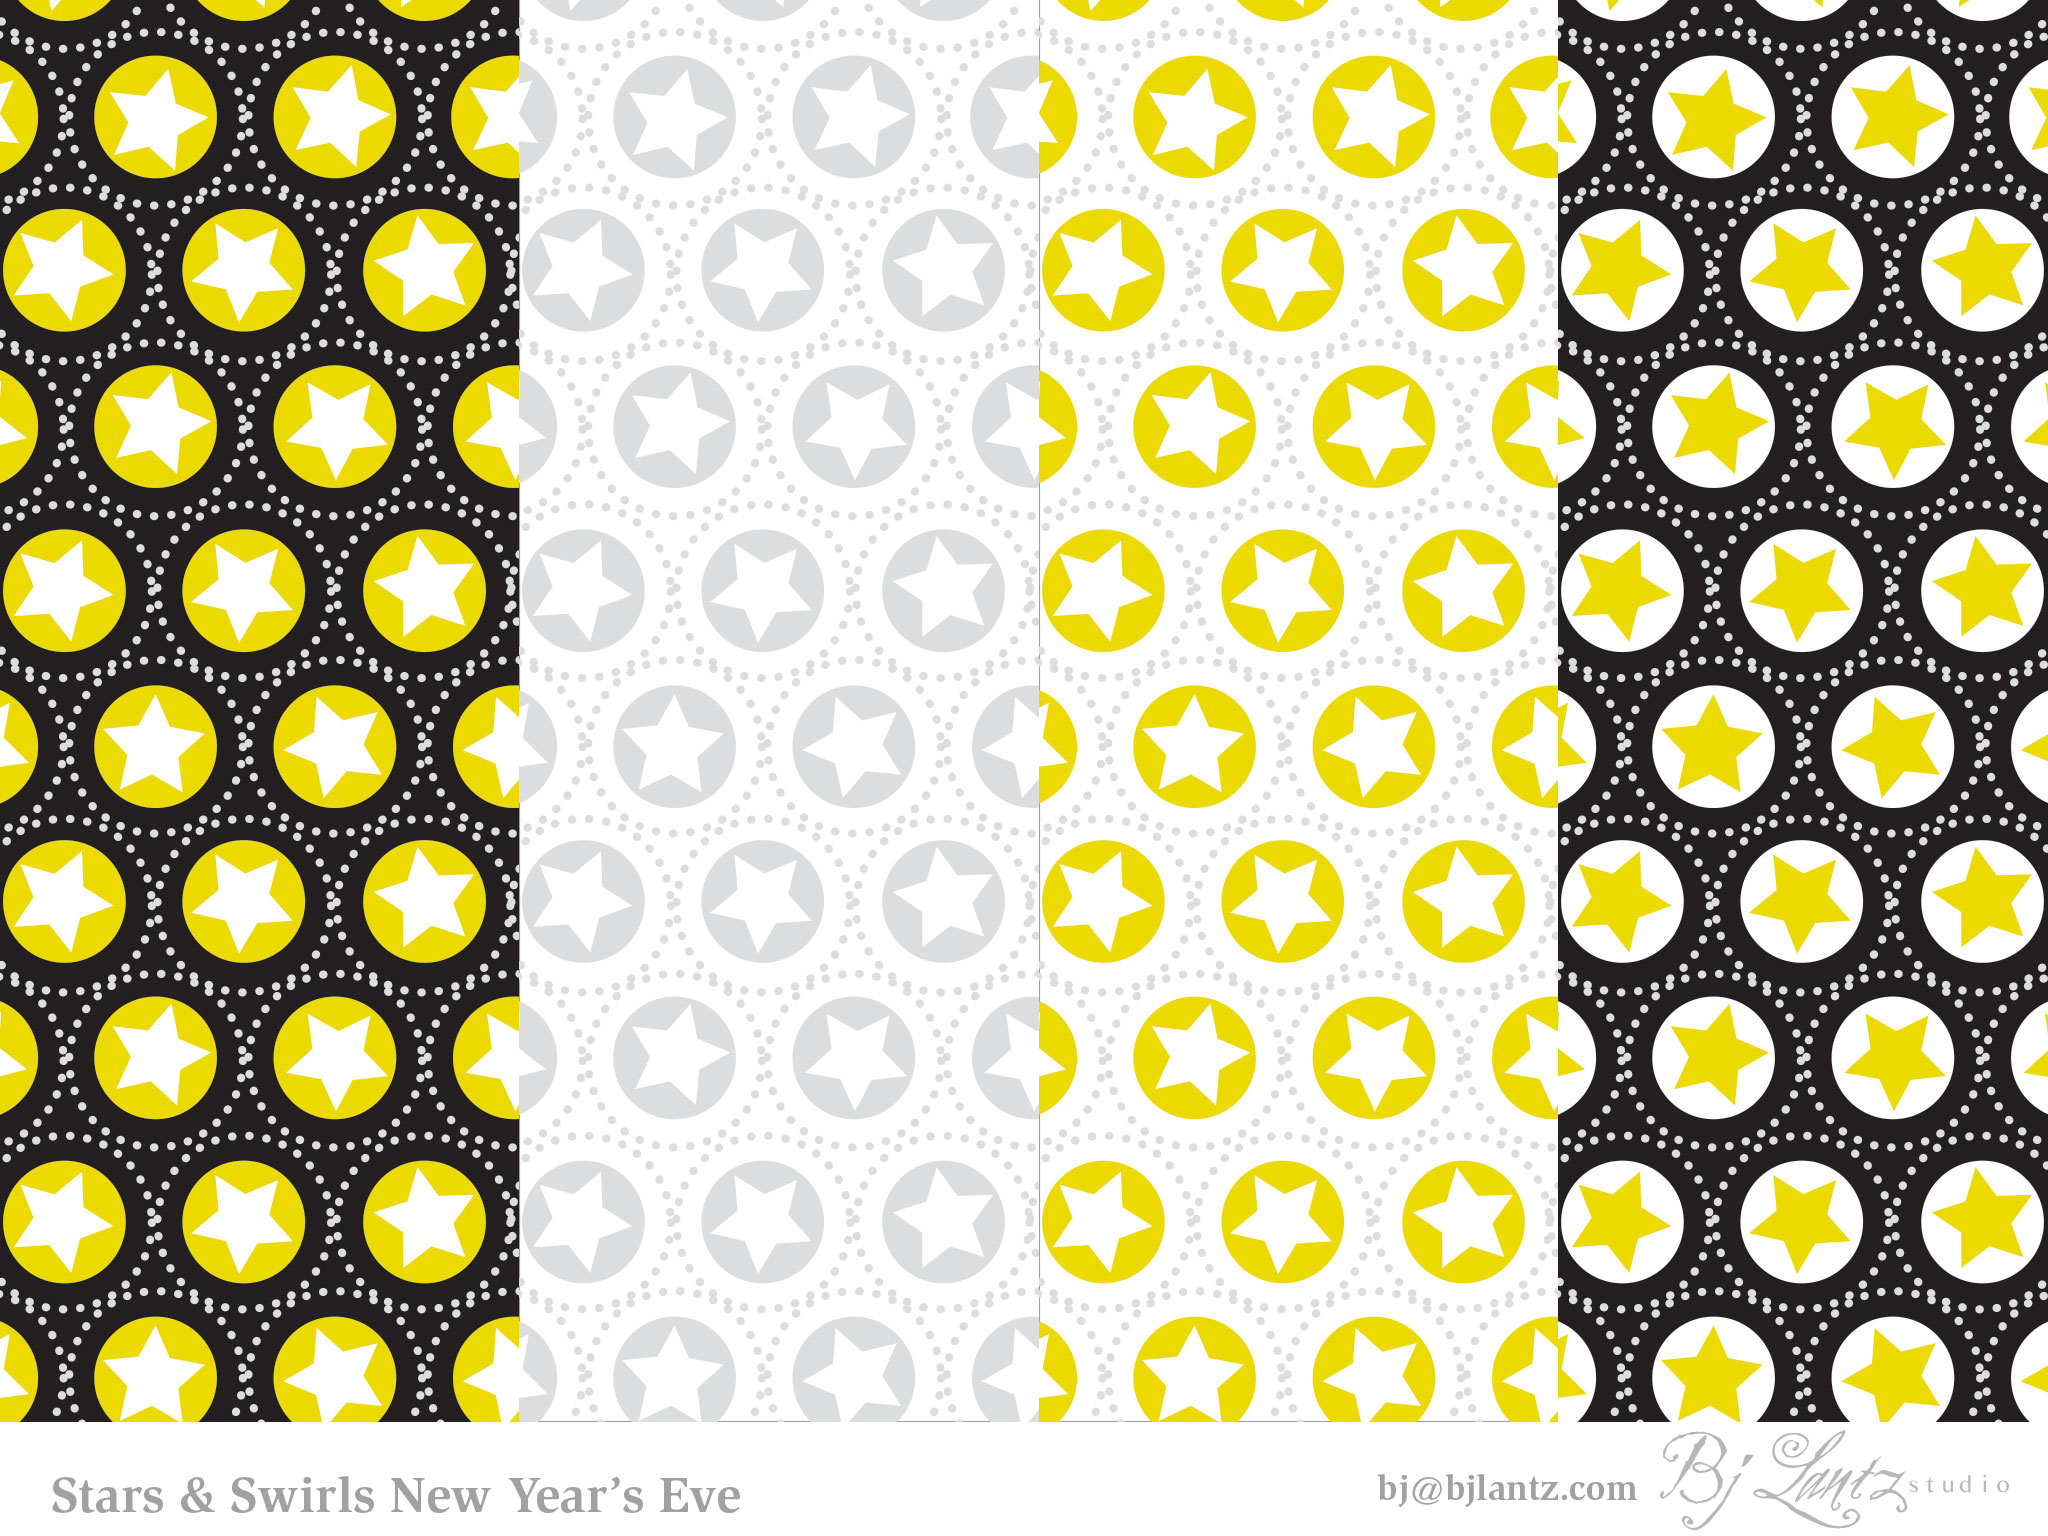 Stars-Swirls-BJ-Lantz_2.jpg